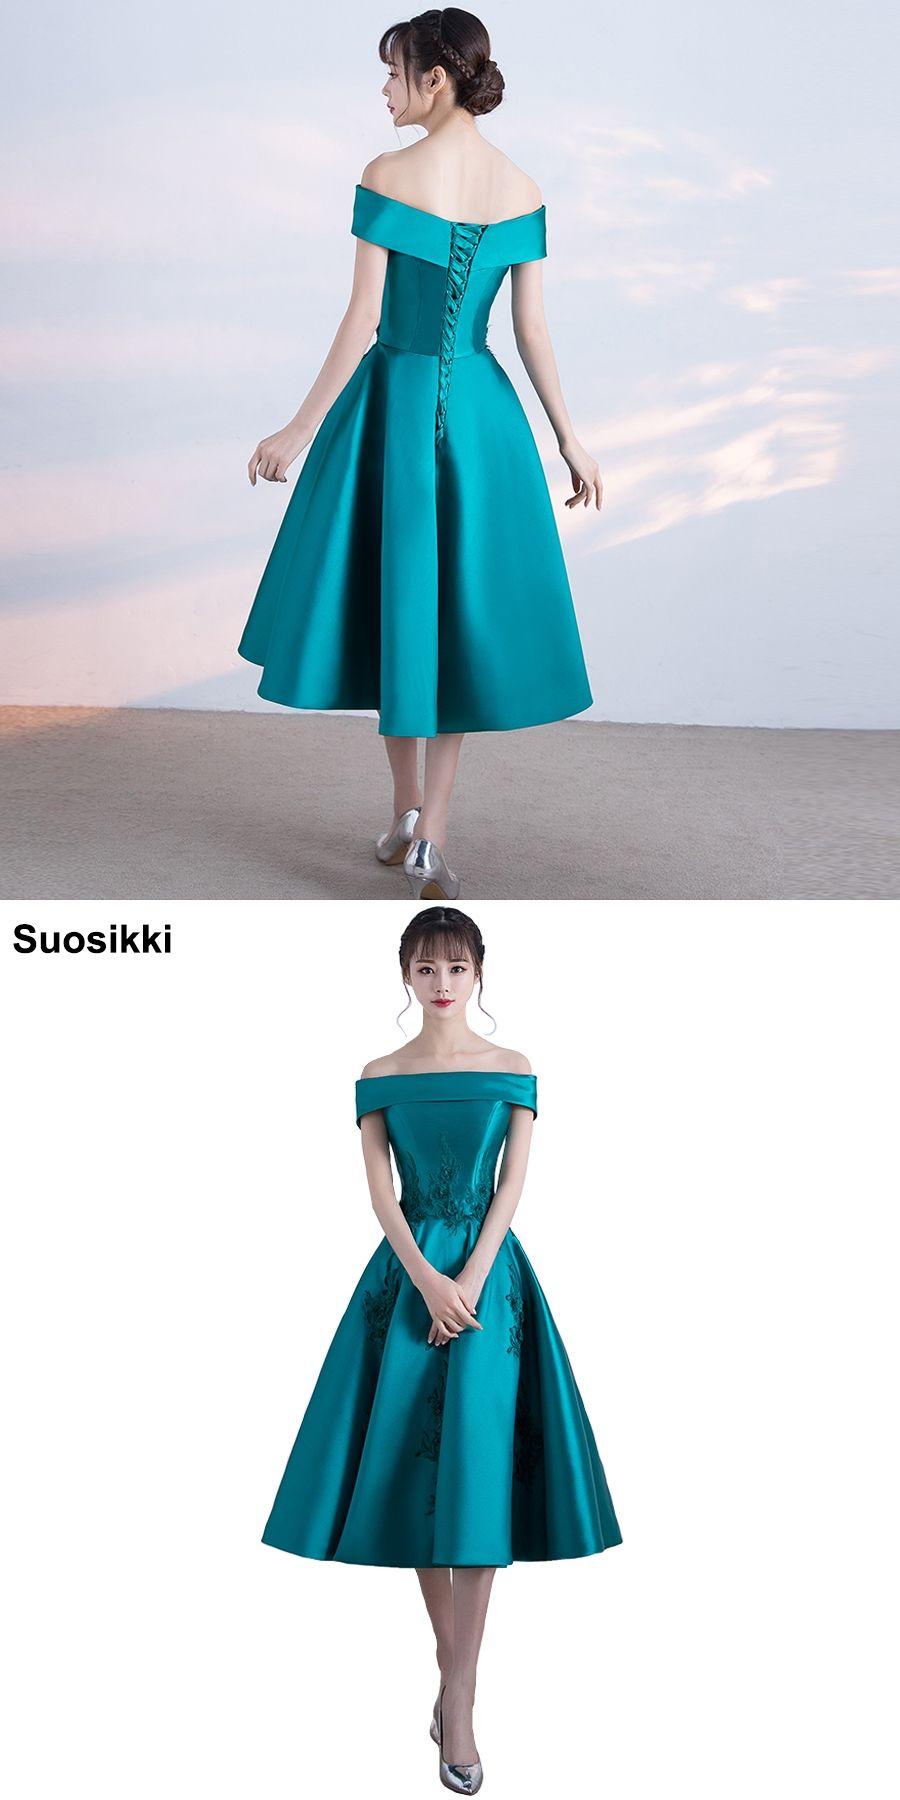 7503c9c425f Short prom dress 2018 boat neck a line formal evening dresses embroidery  fata plus size robe de soiree longue